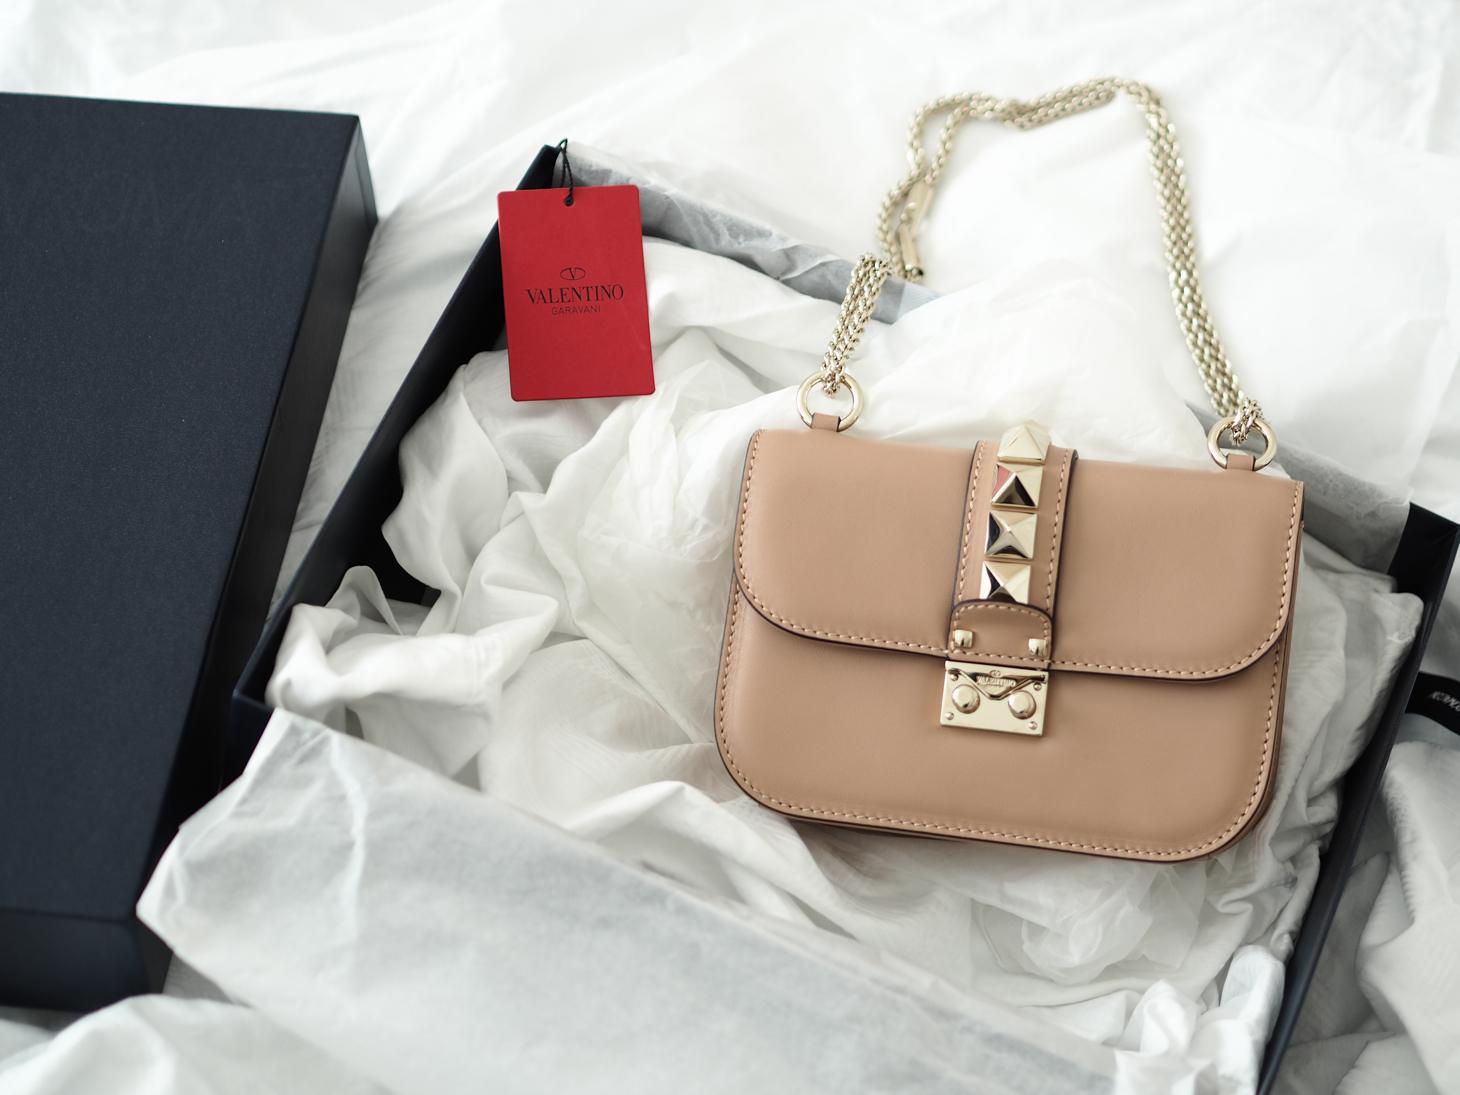 Valentino Lock Bag Review